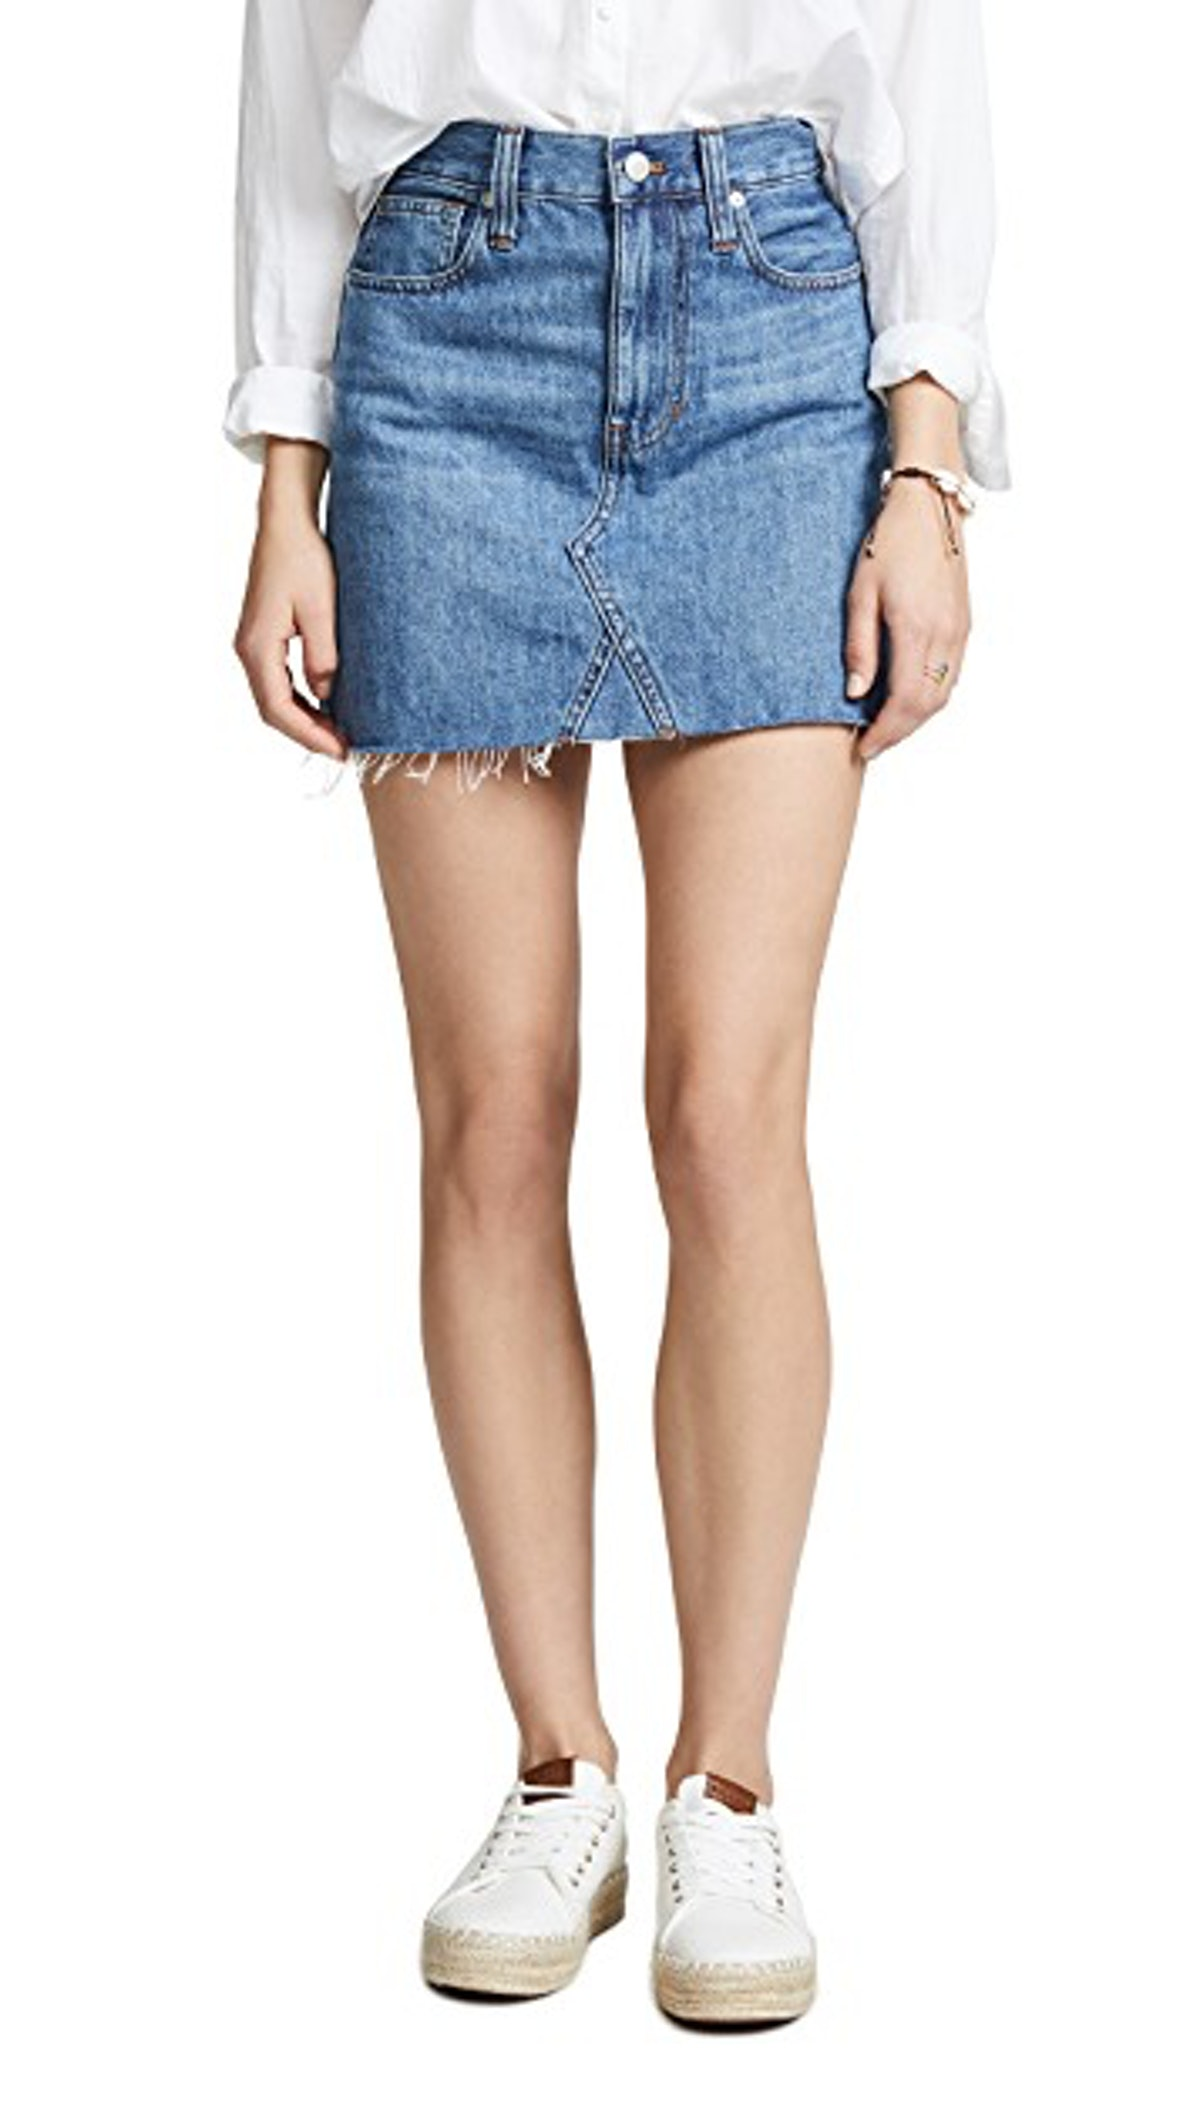 Madewell Rigid Denim A-Line Mini Skirt in Lakeline Wash